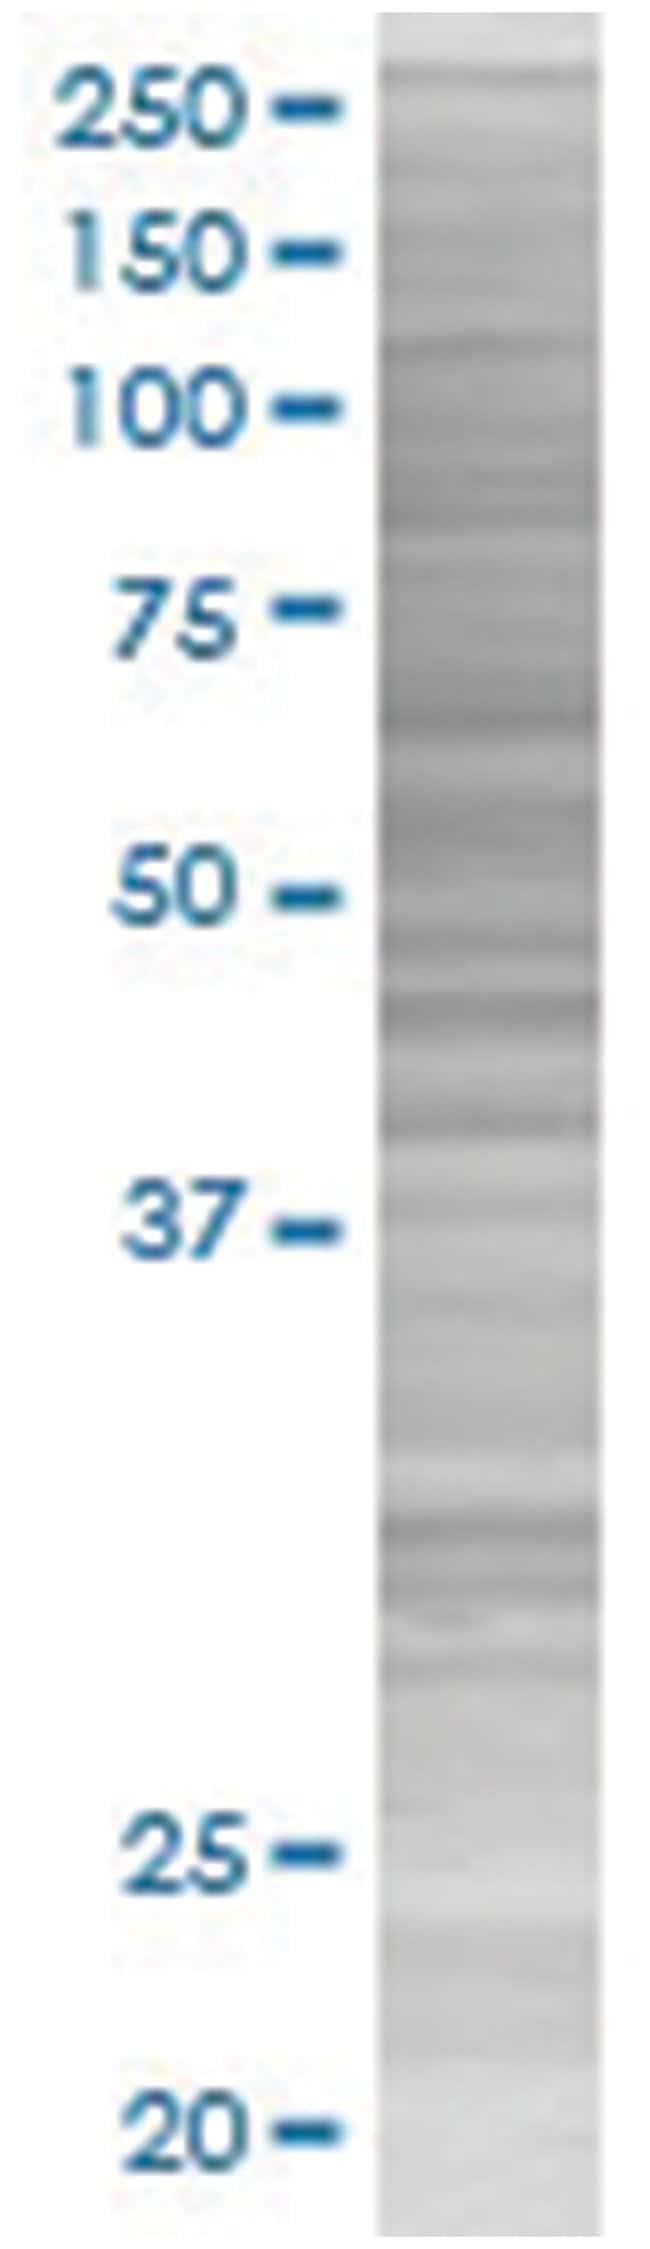 NTRK2 293T Cell Overexpression Lysate (Denatured), Abnova 100µL:Life